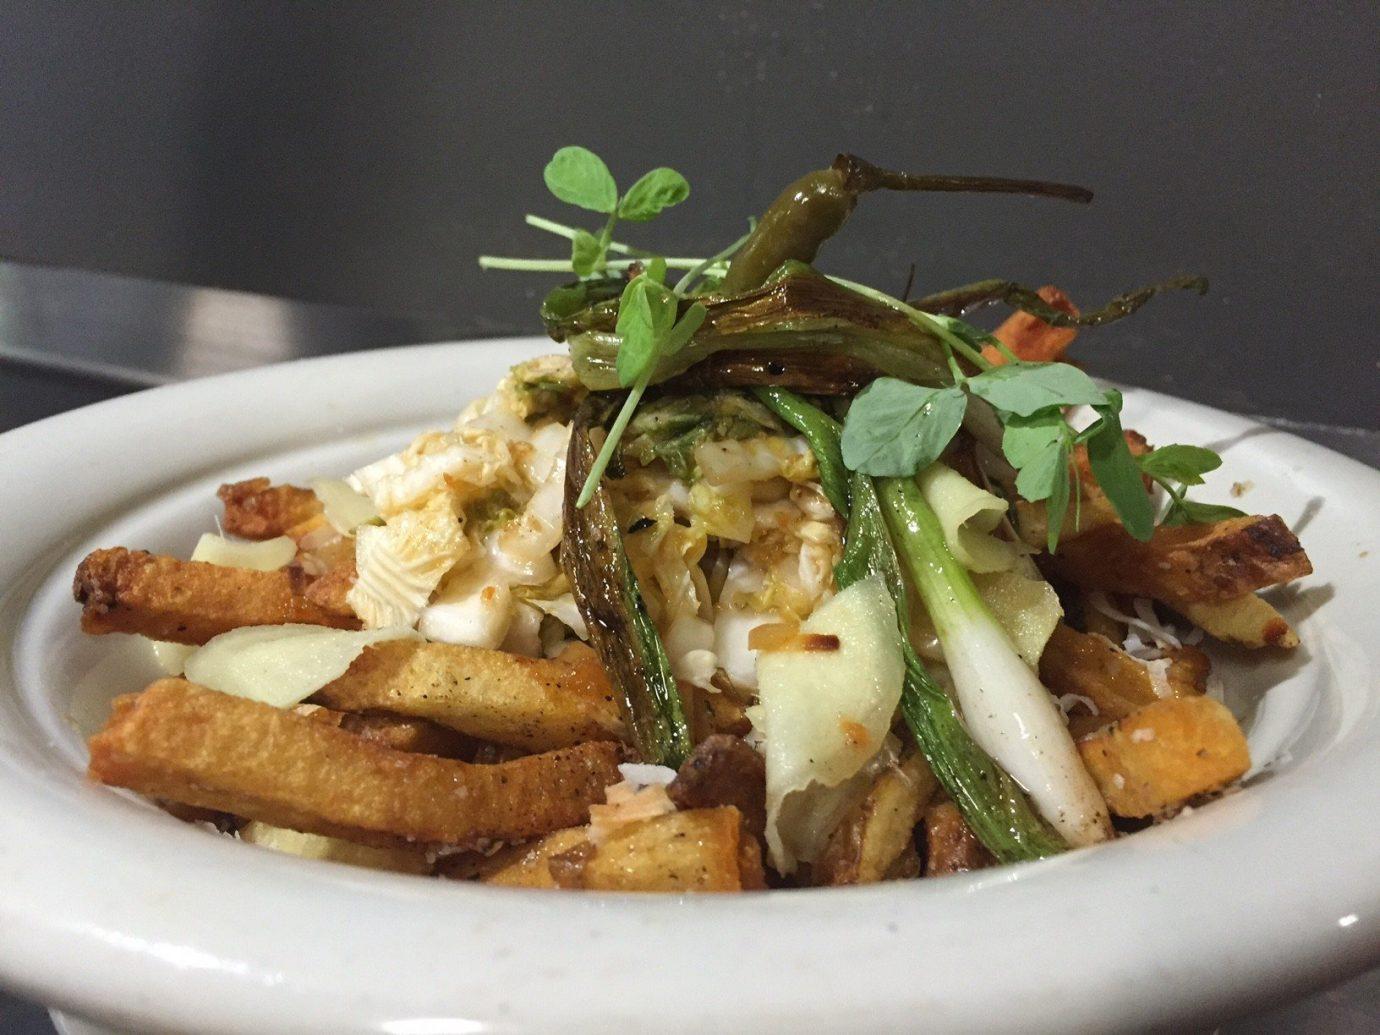 Food + Drink plate food dish indoor cuisine vegetarian food Seafood meat meal containing piece de resistance